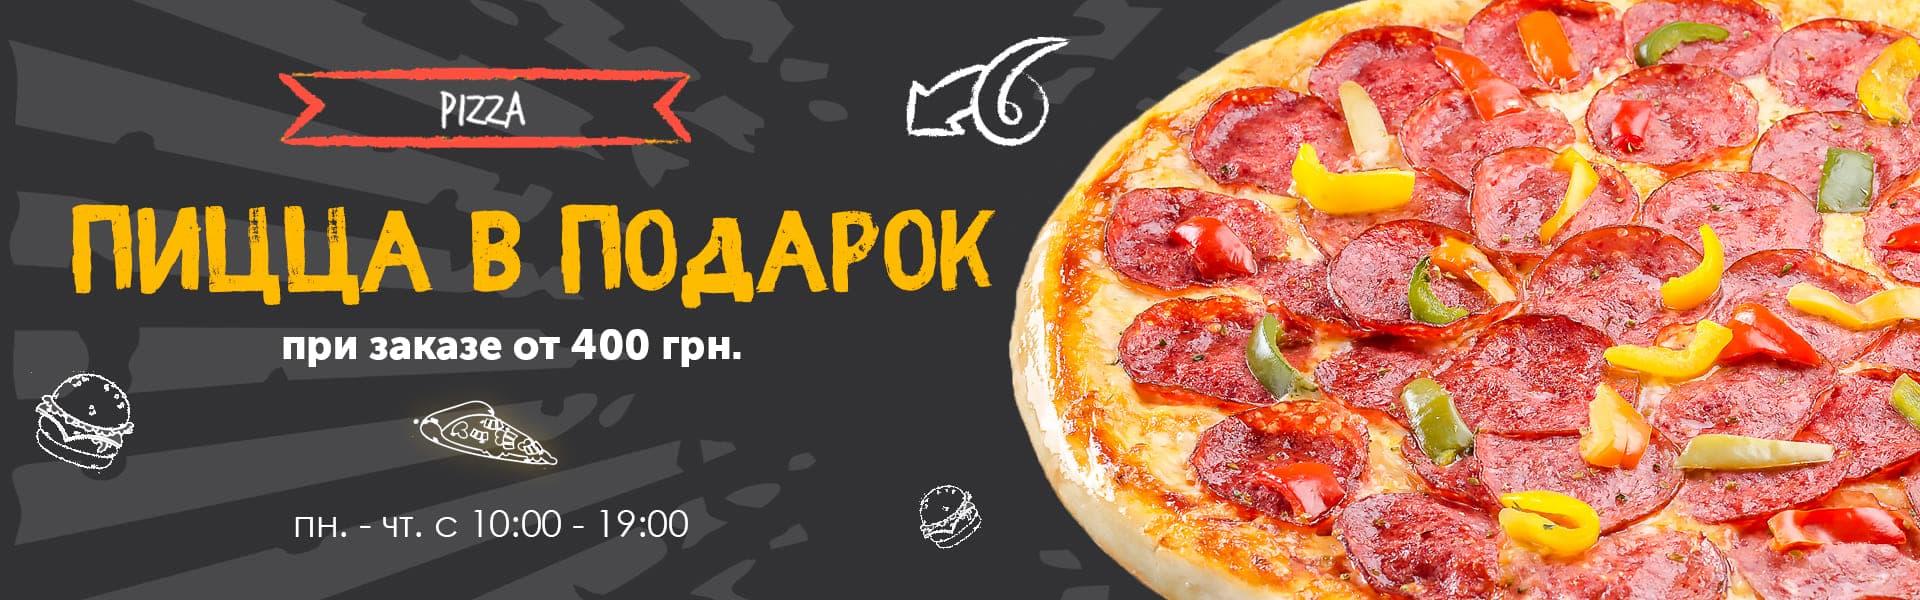 Фото - Пицца в подарок      - Пиццбург